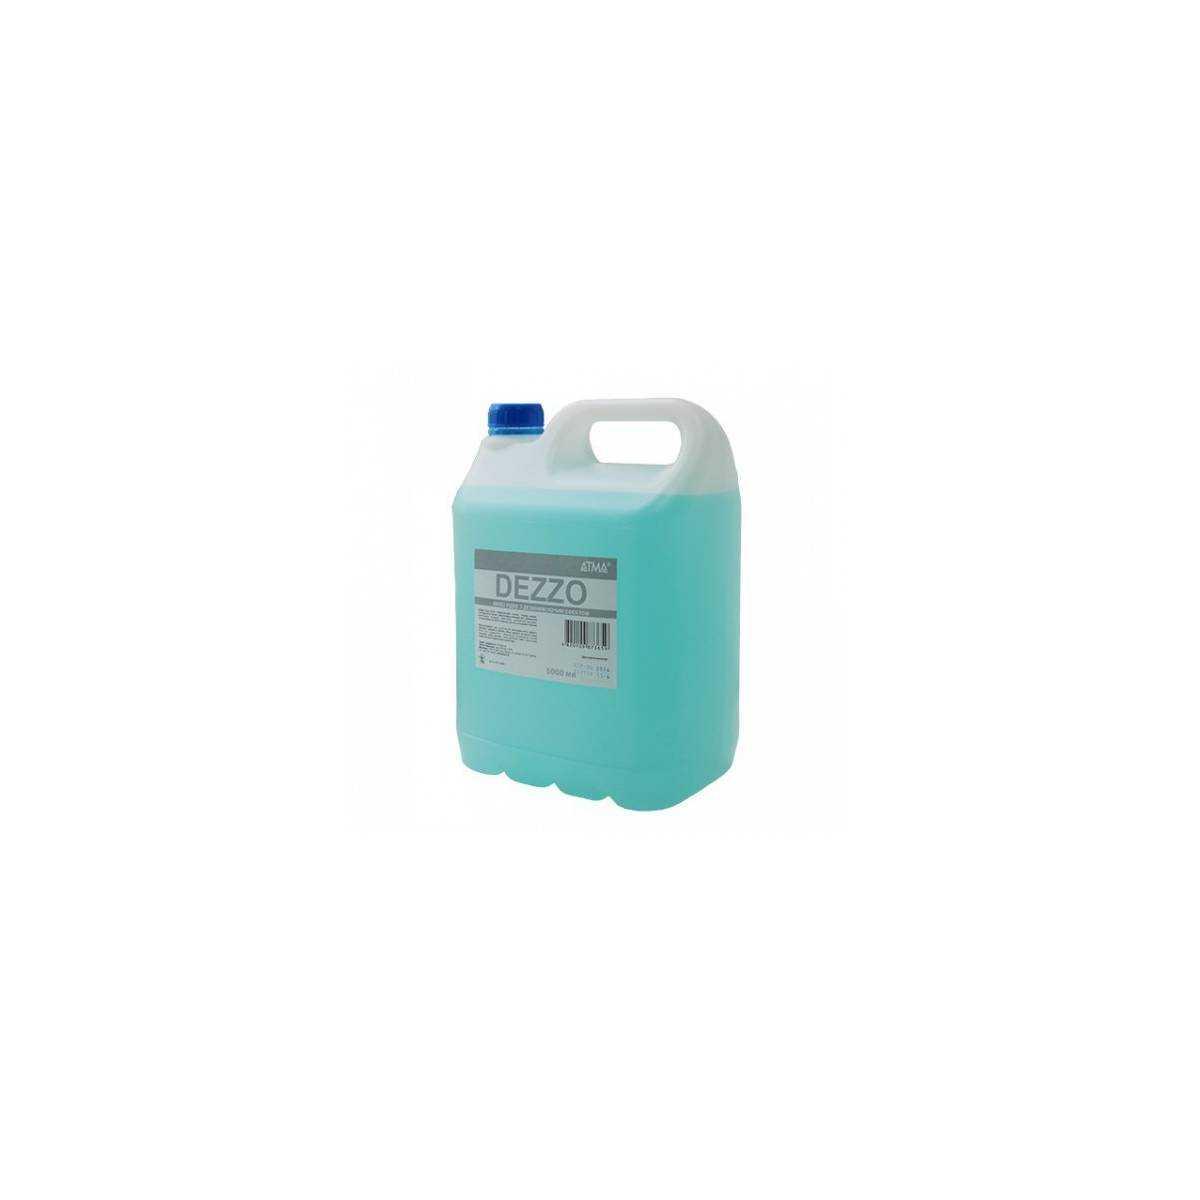 Мыло жидкое DEZZO с дезинфицирующим эффектом 5л 6M 015000 Атма